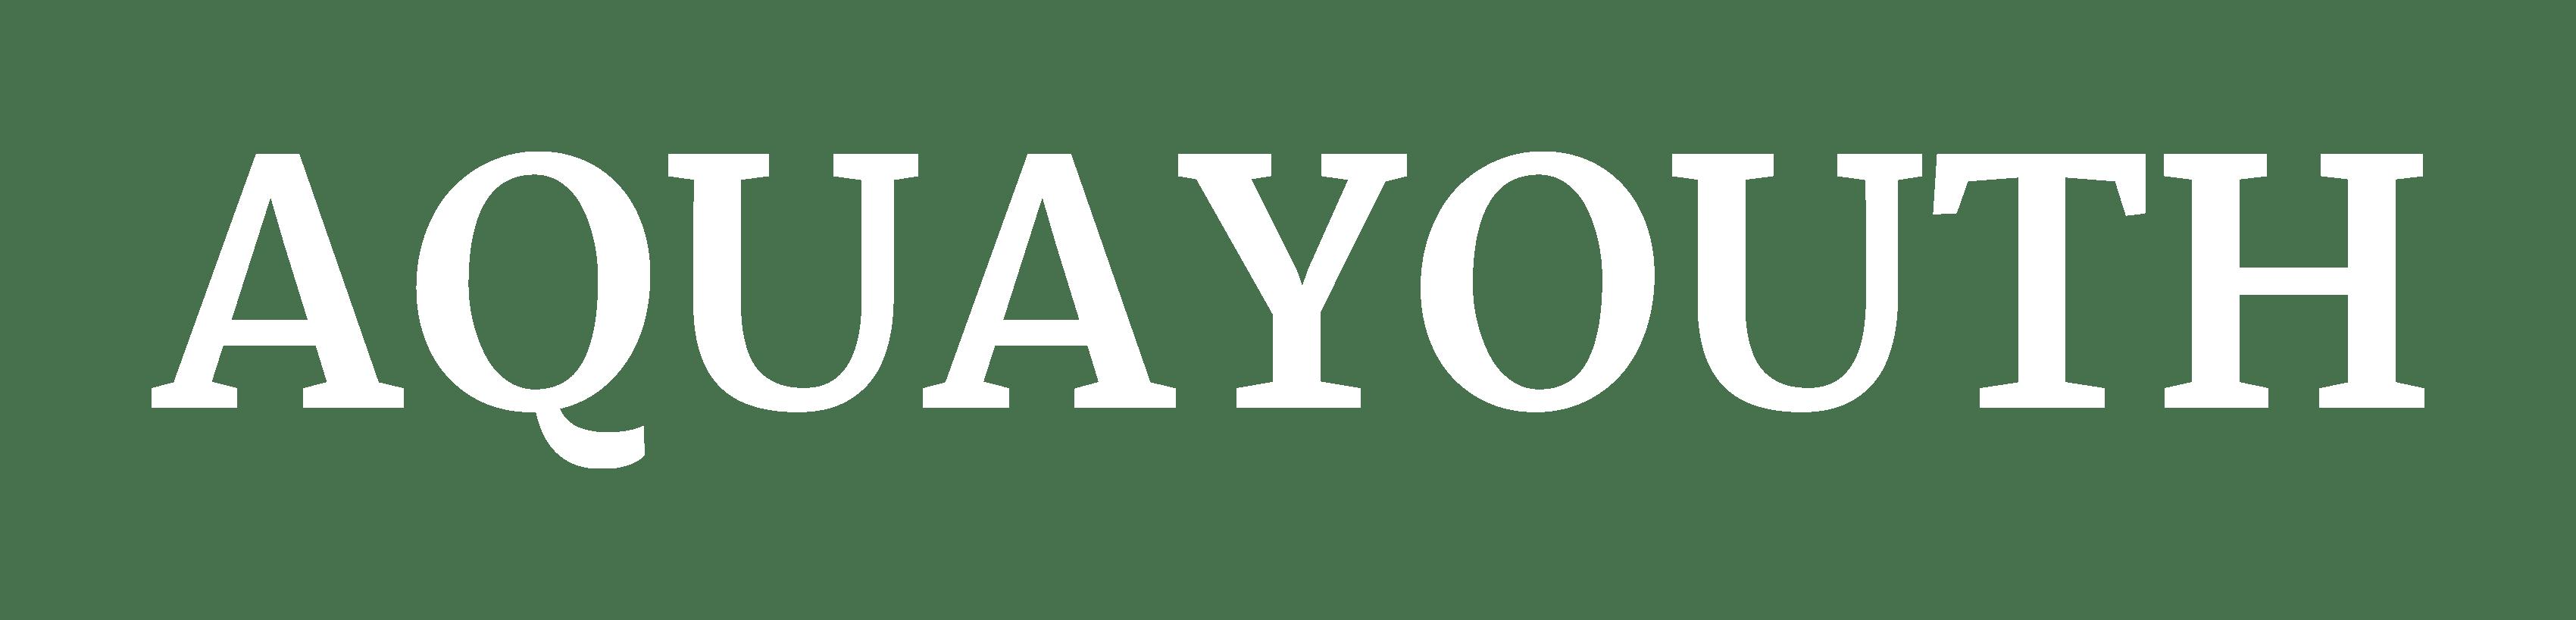 AquaYouth